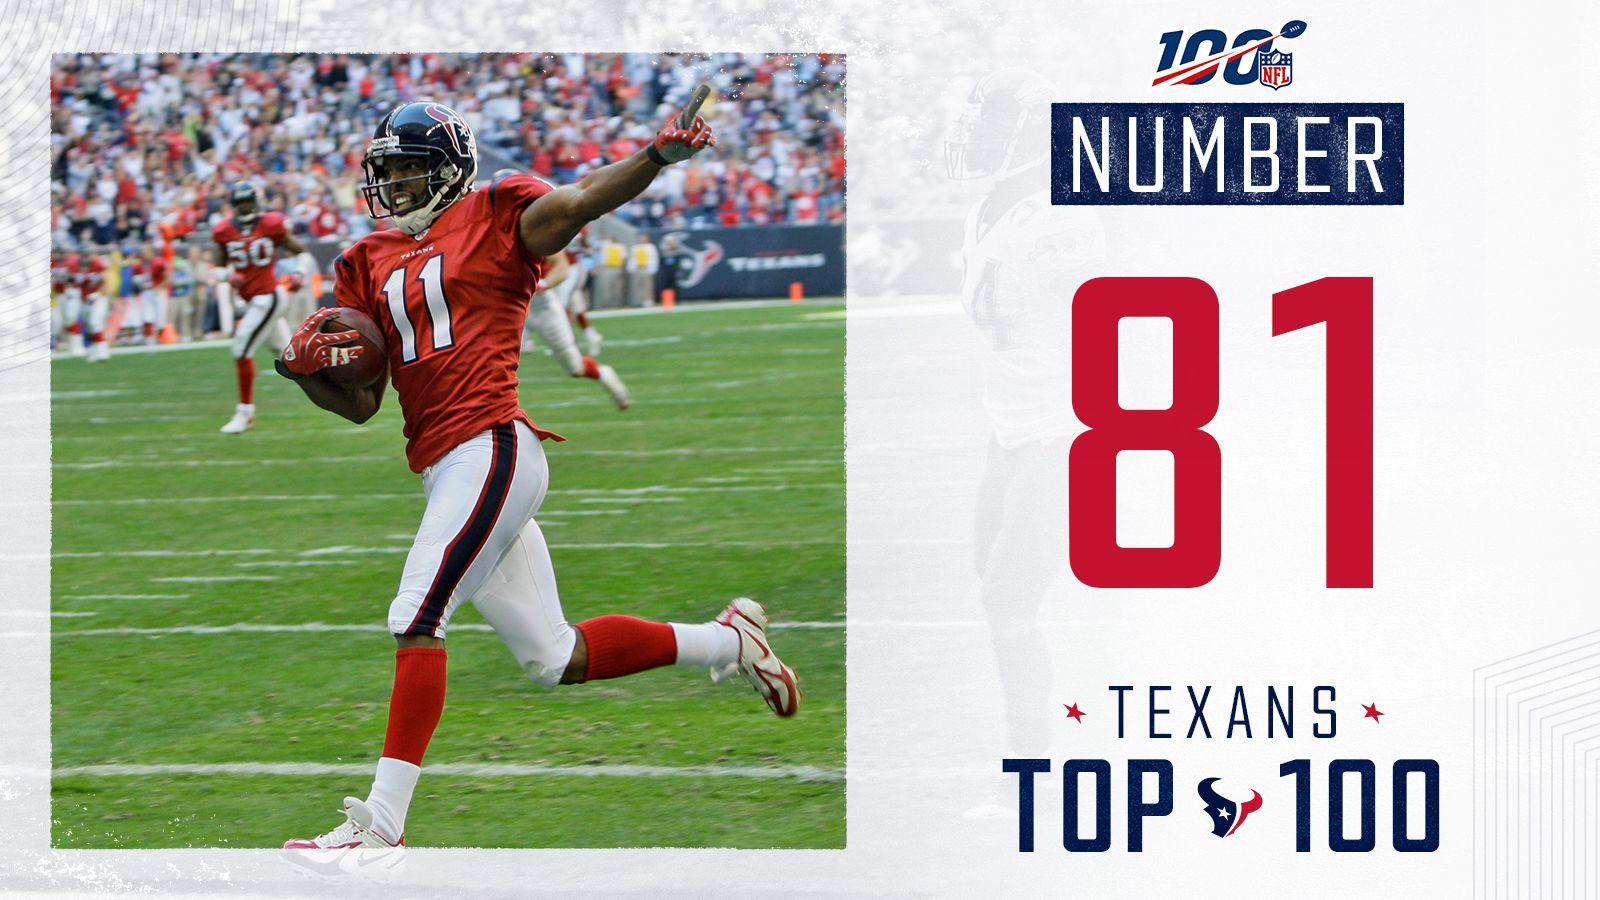 81_Texans beat Jaguars in 2007 - TWITTER